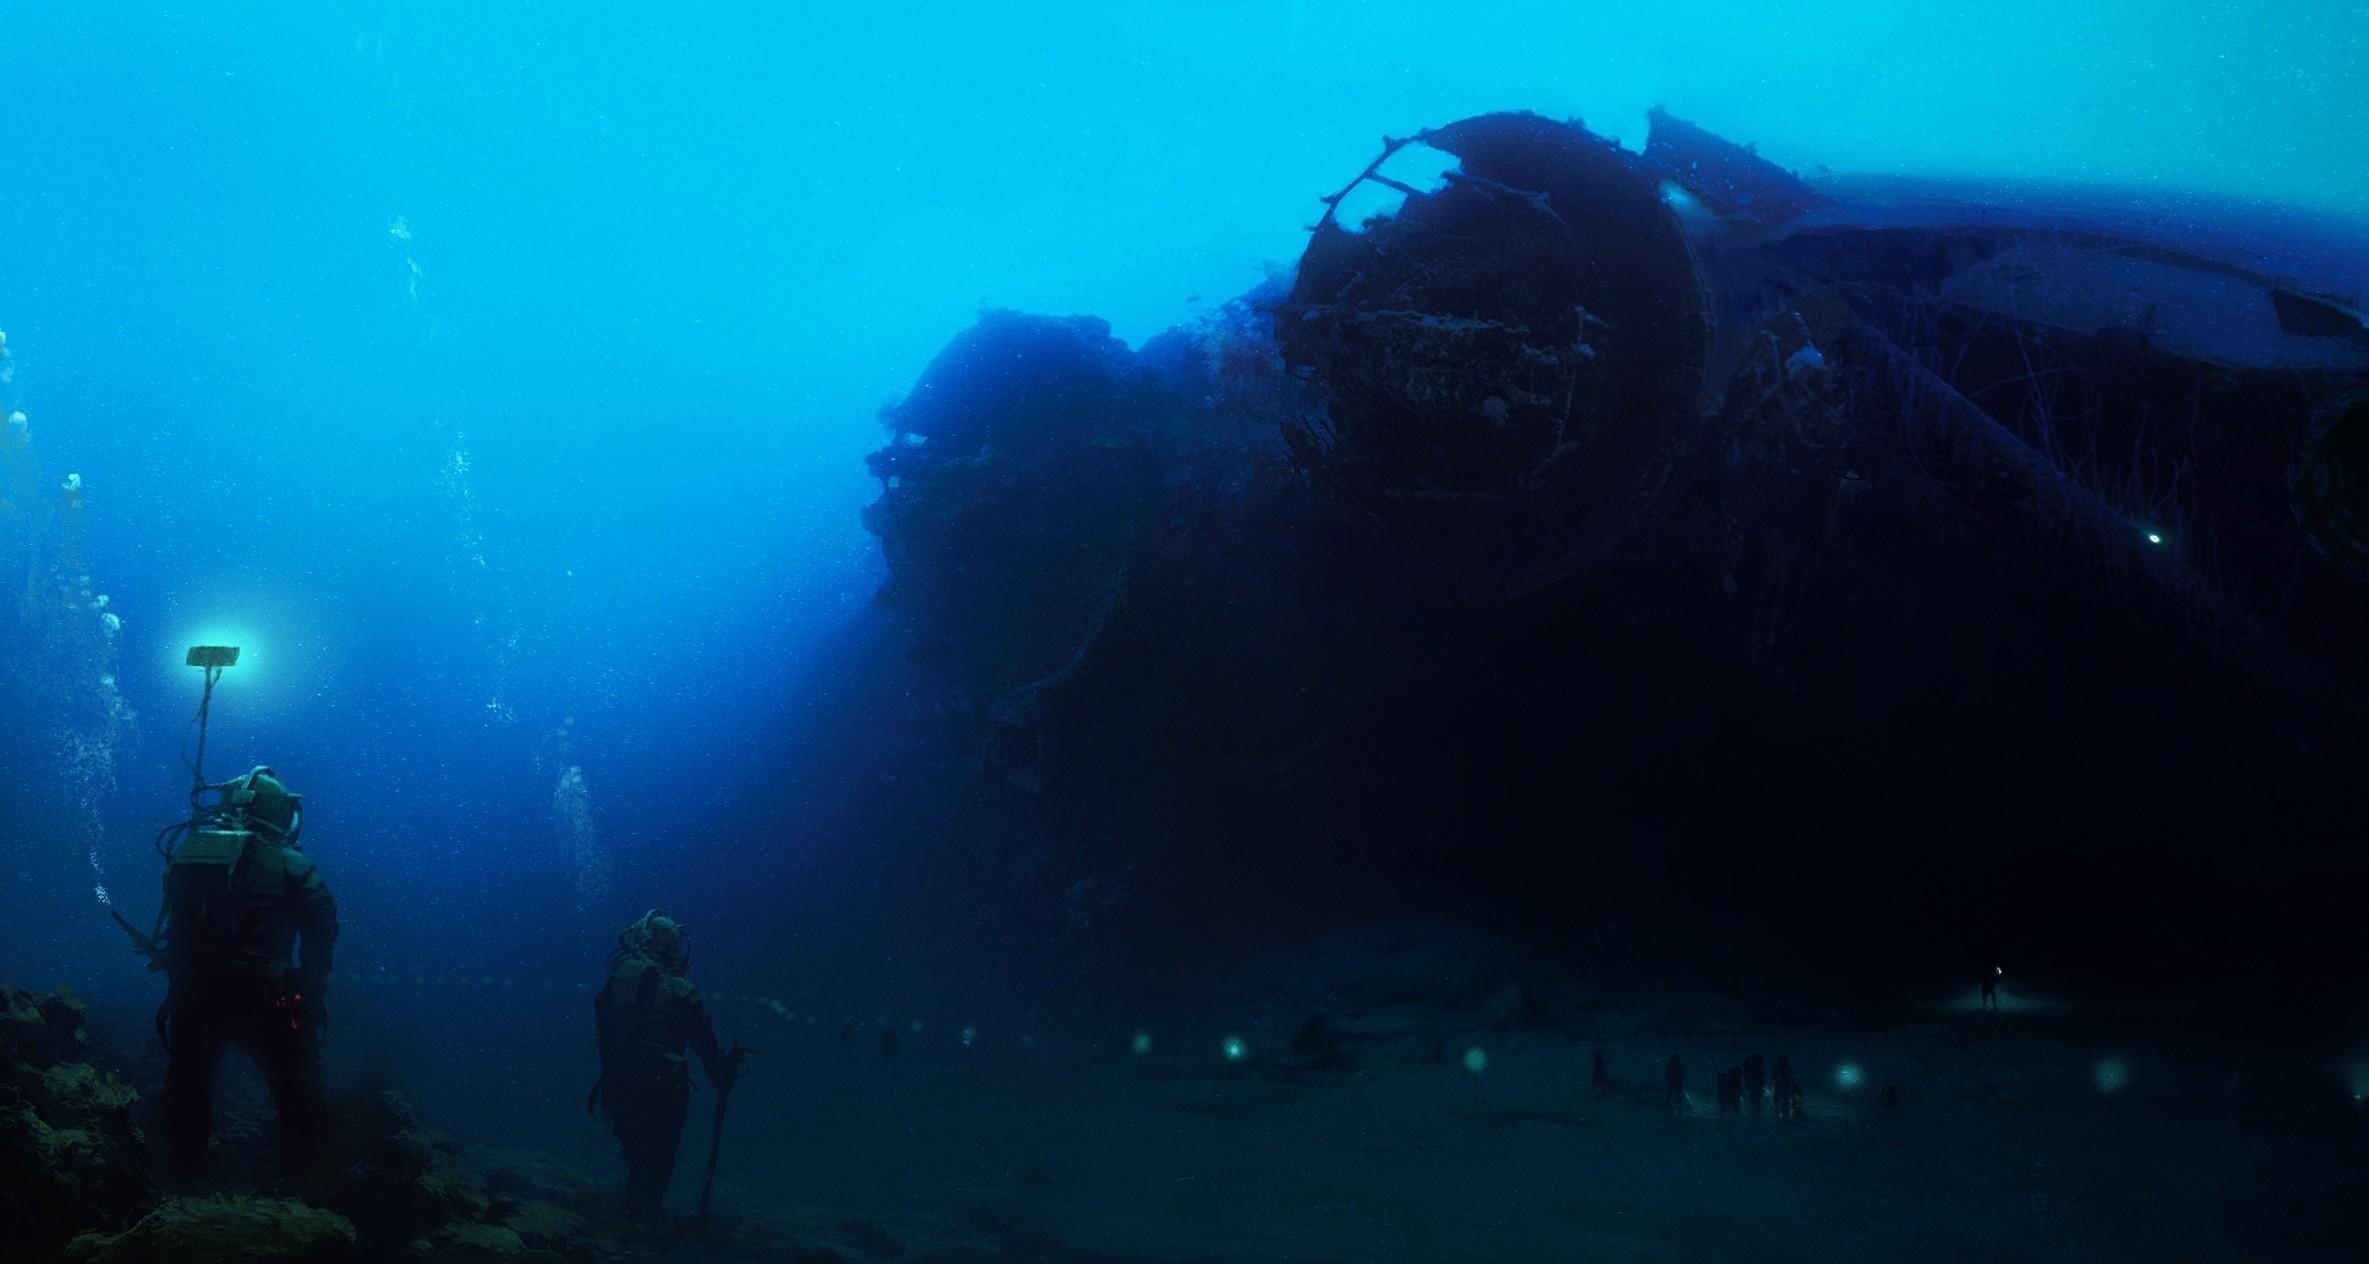 Wallpaper Sea Wreck Divers Scuba Diving Reef Outdoor